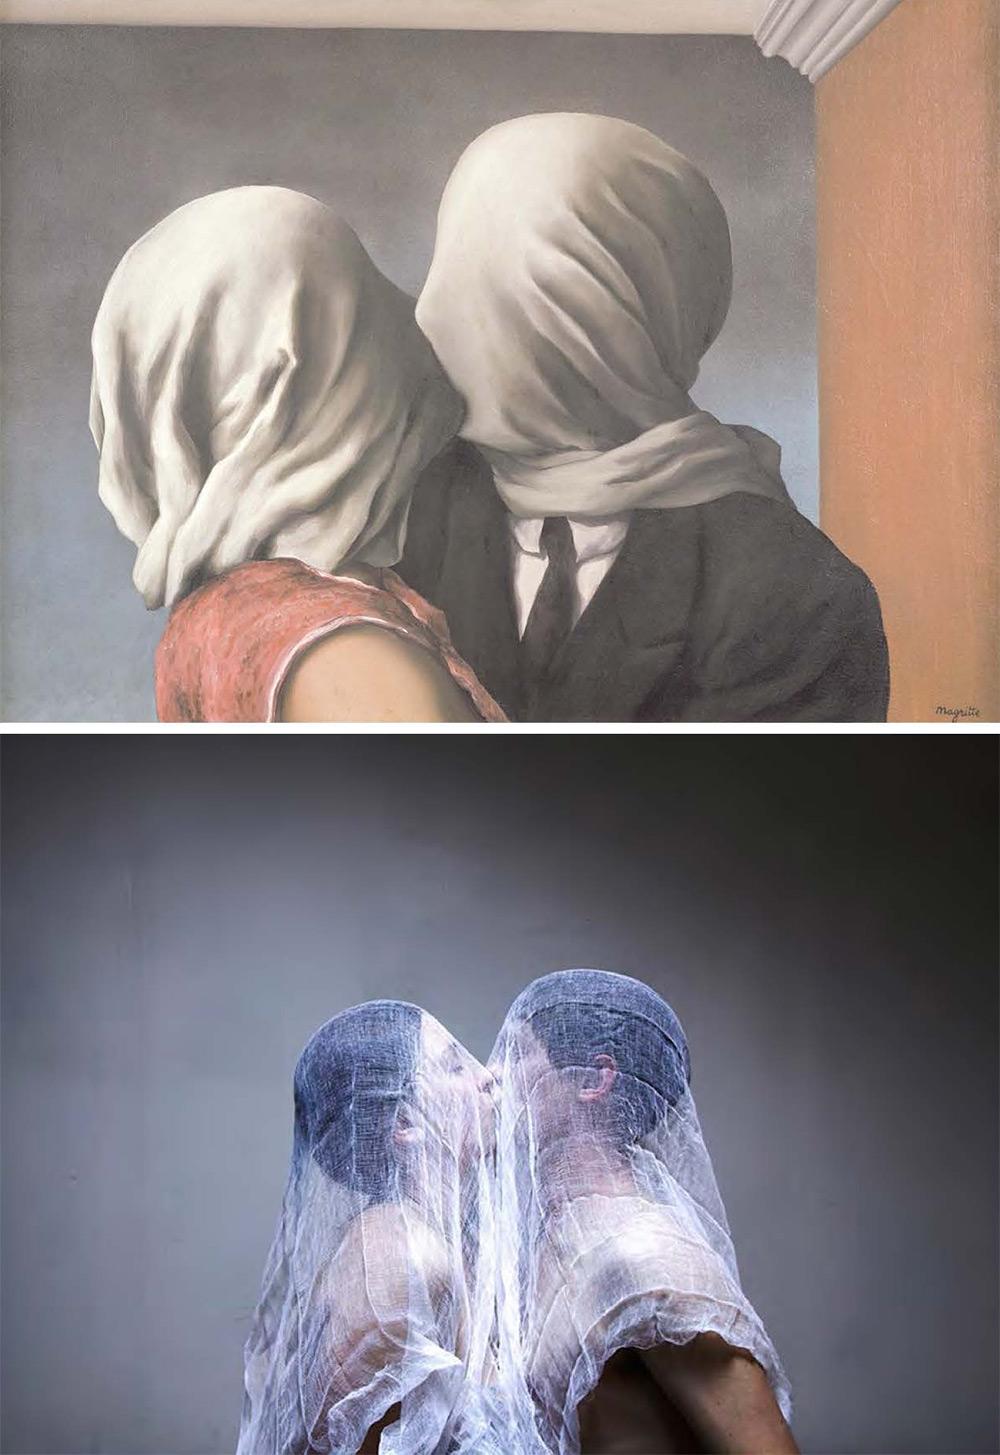 dipinti-famosi-interpretati-versione-fotografica-remake-6